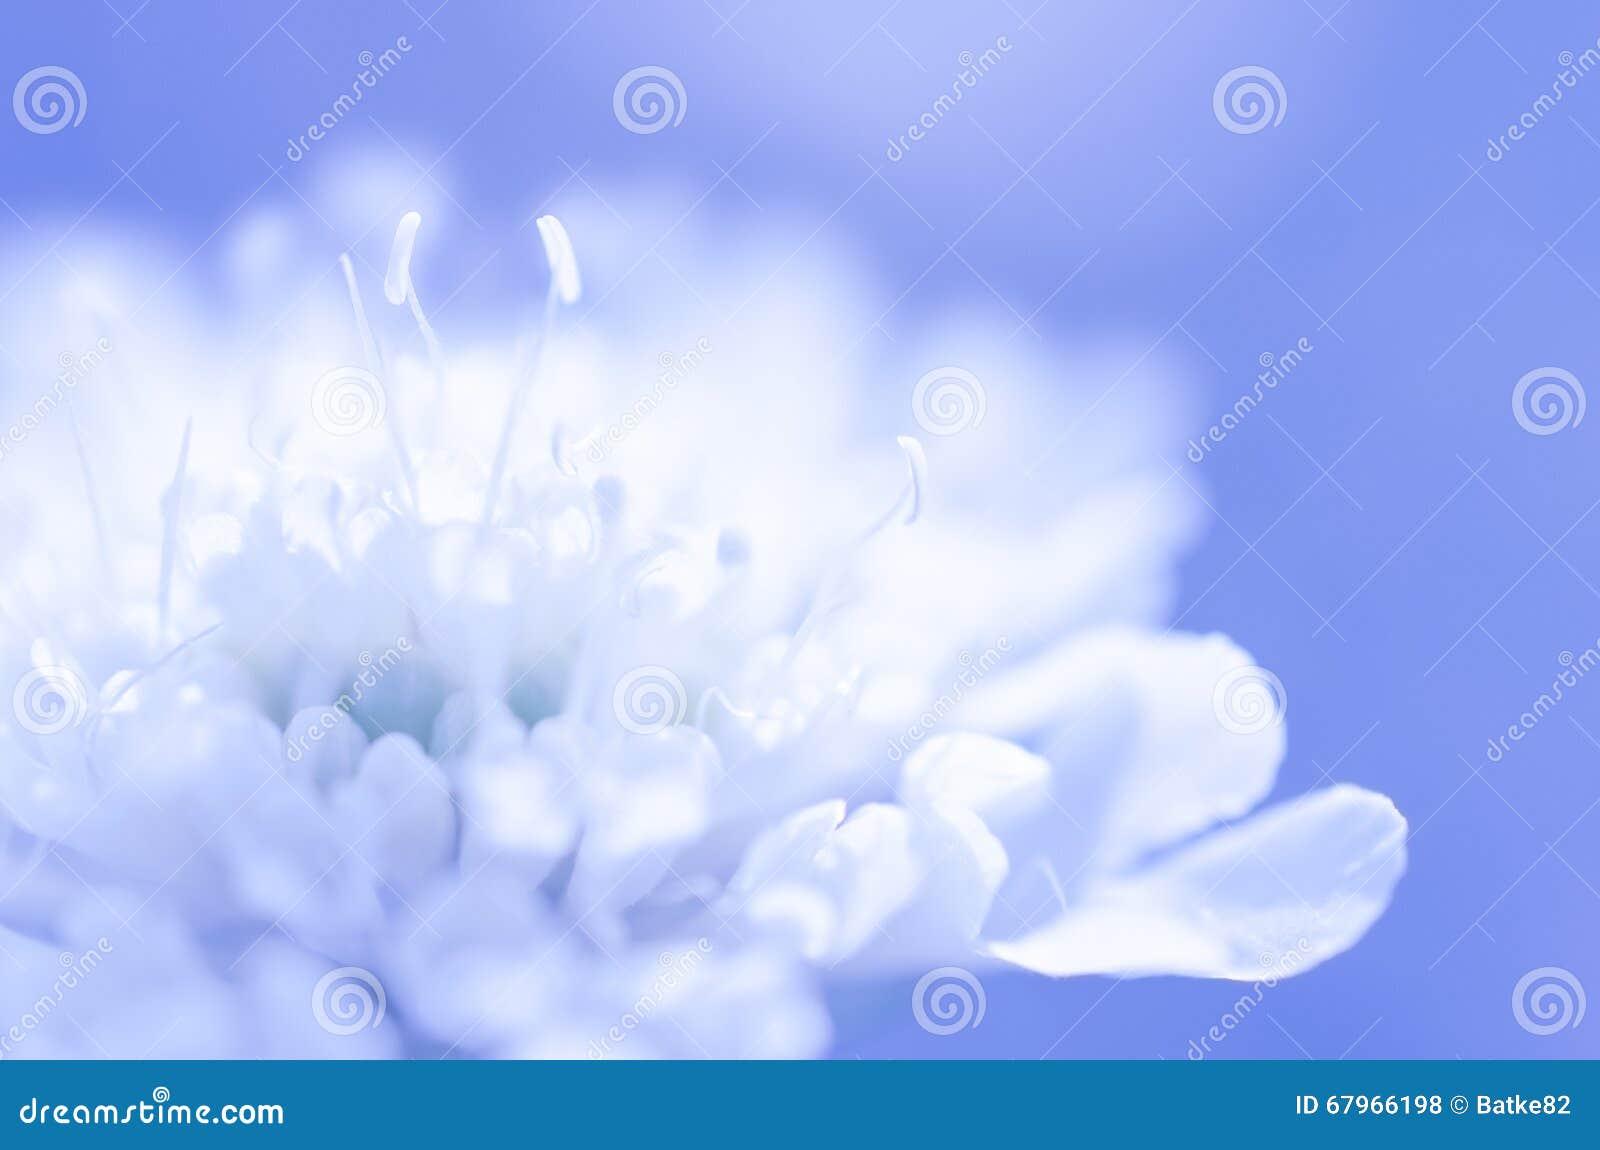 Dreamy White Flower On Blue Background Stock Photo - Image ...